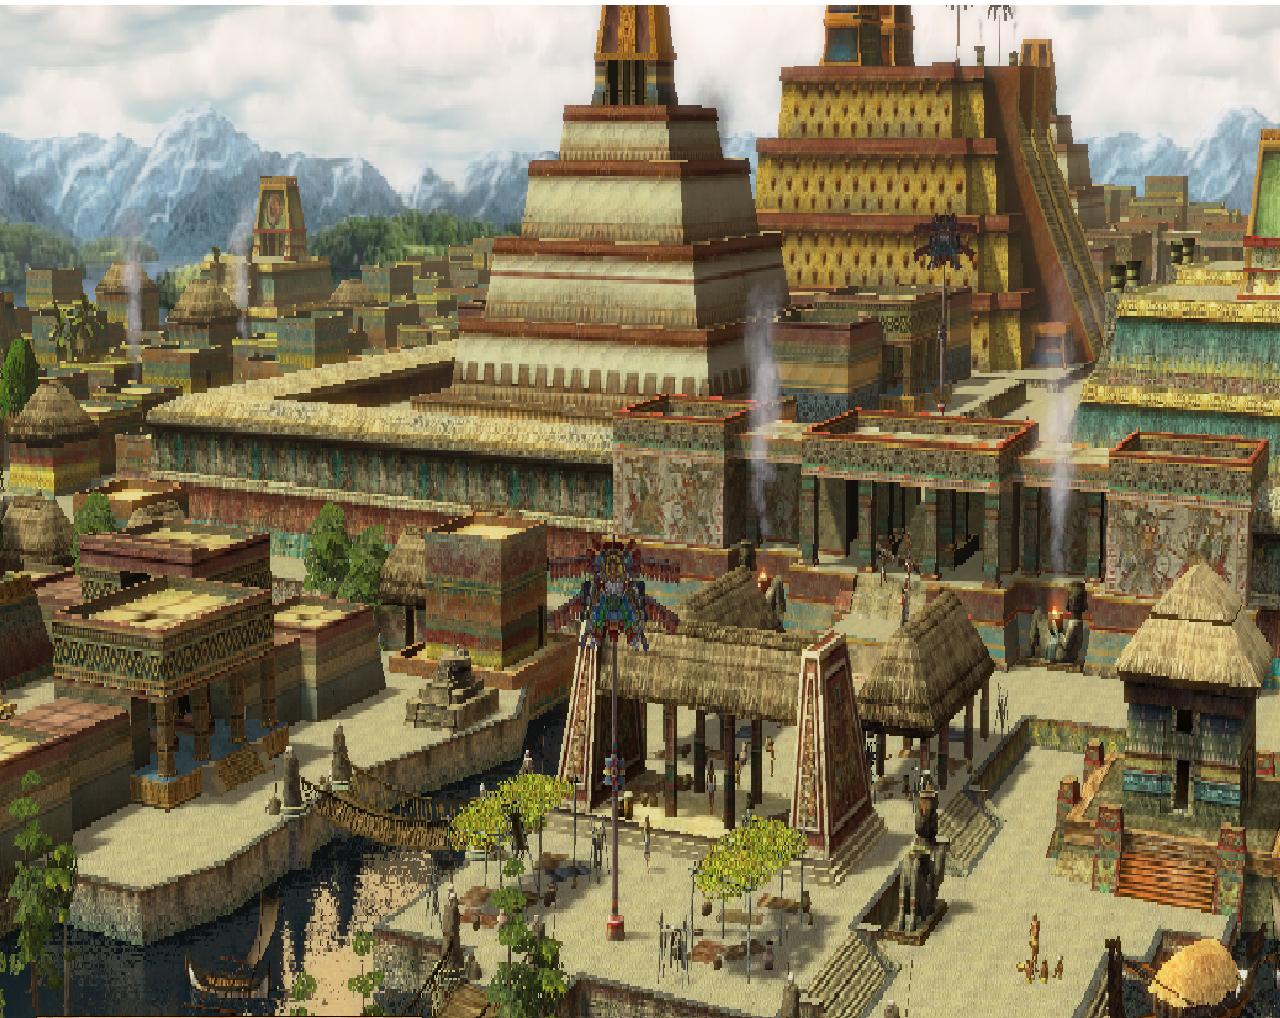 Tenochtitlan dans Age of Empires III: The WarChiefs